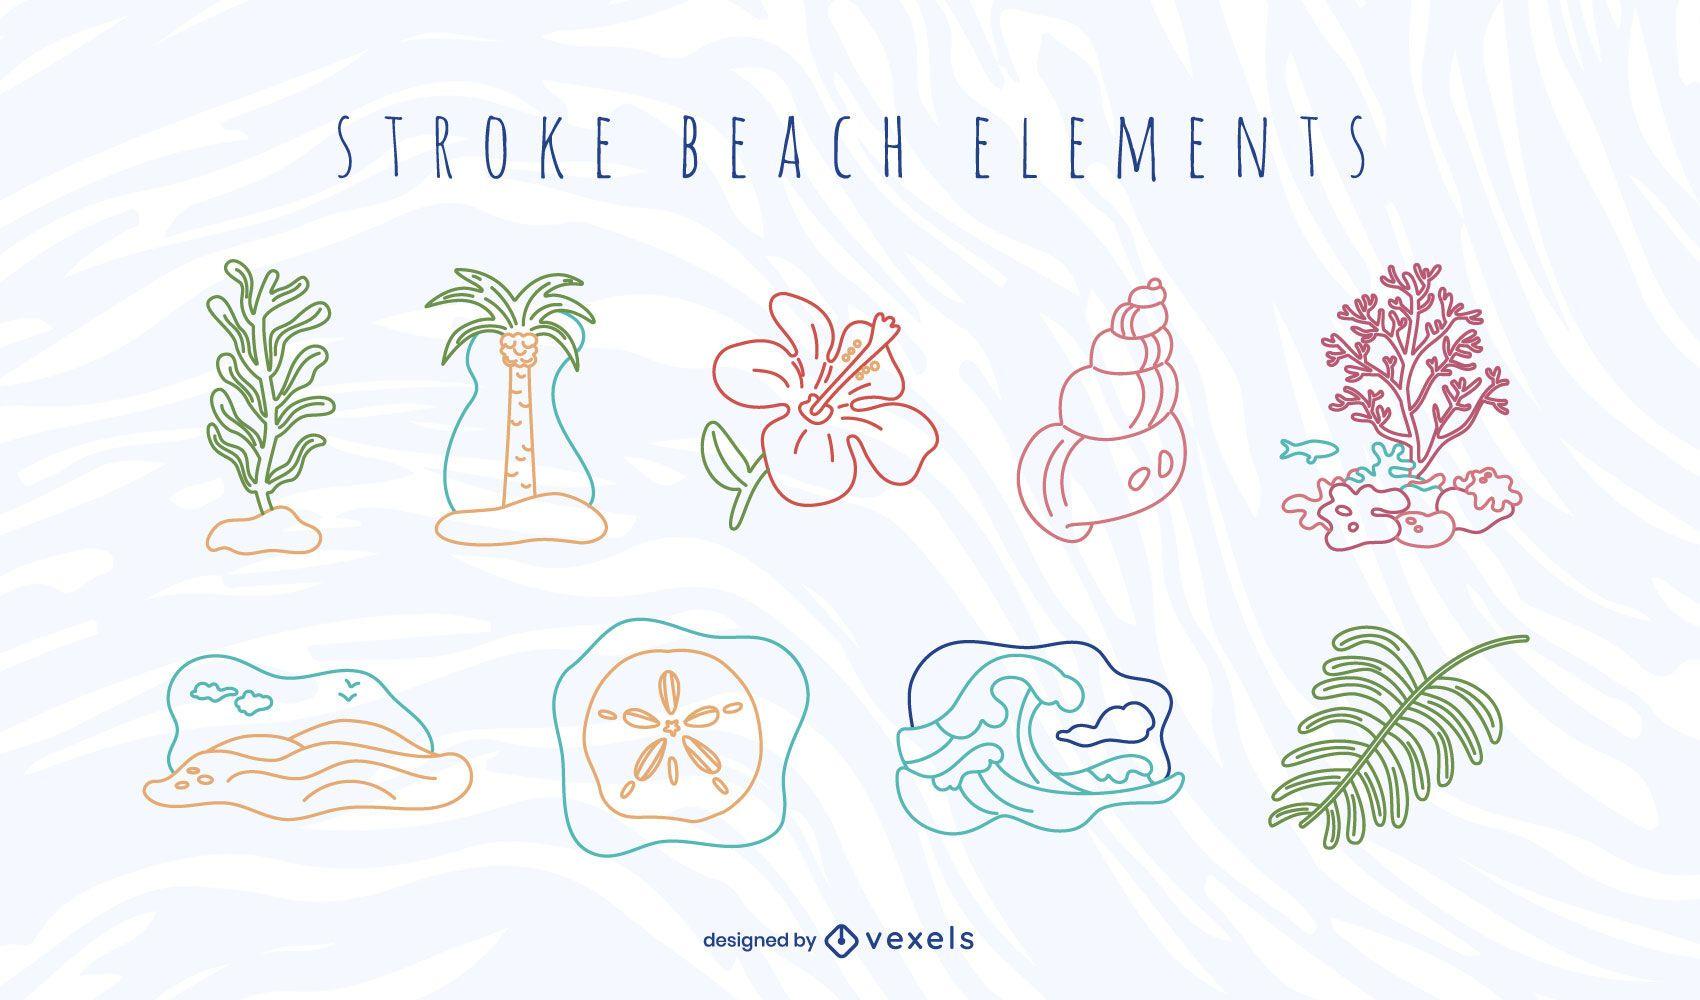 Stroke beach element set